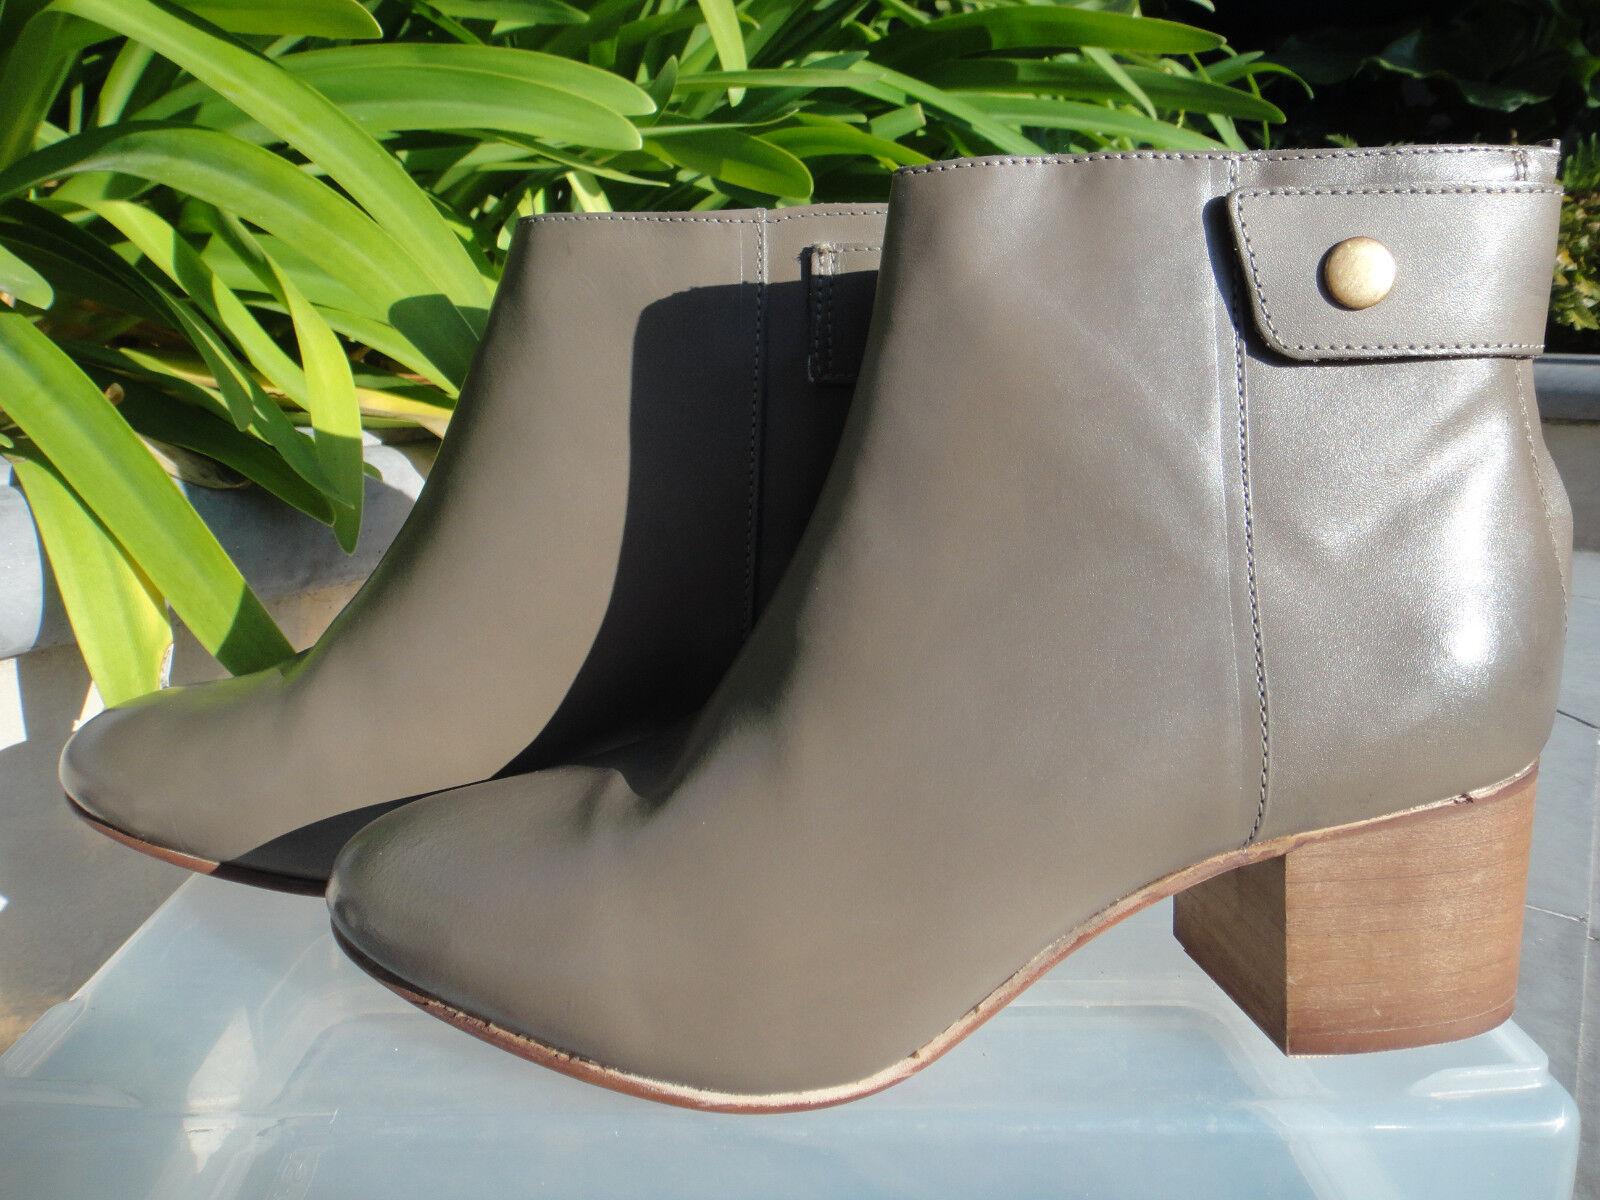 Topshop BONNET Bootie, Ankle Boot, Back Toe, Zip & Snap, Almond Toe, Back EUR 37 or 38 a4127d